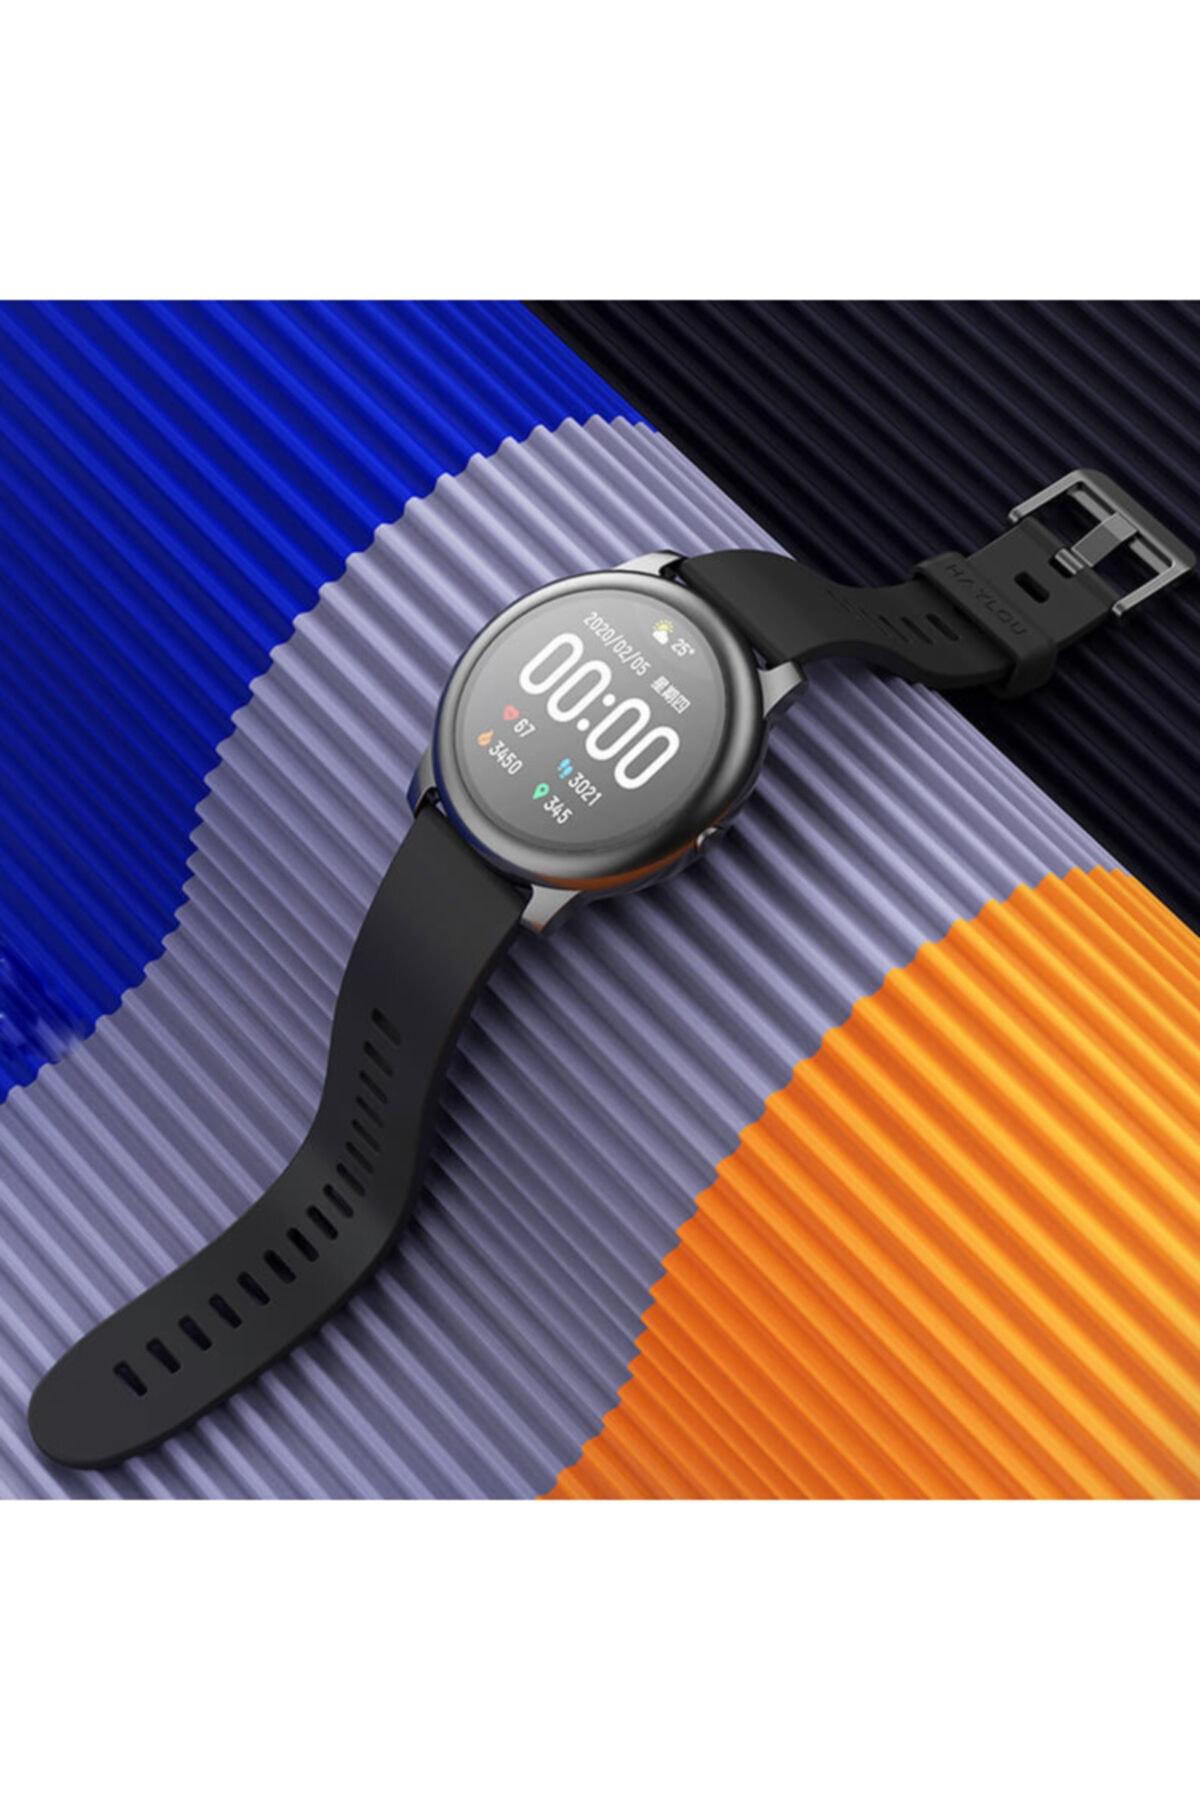 Haylou Solar Ls05 Smart Watch Global Version 2